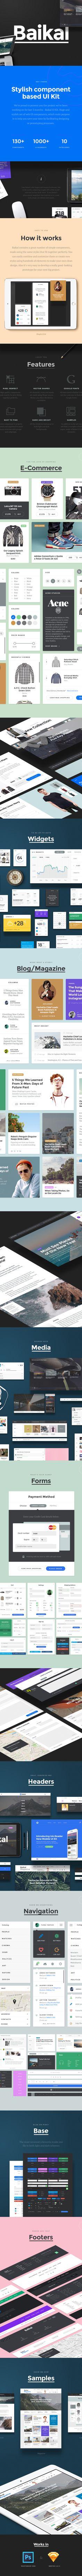 Baikal UI Kit on Behance